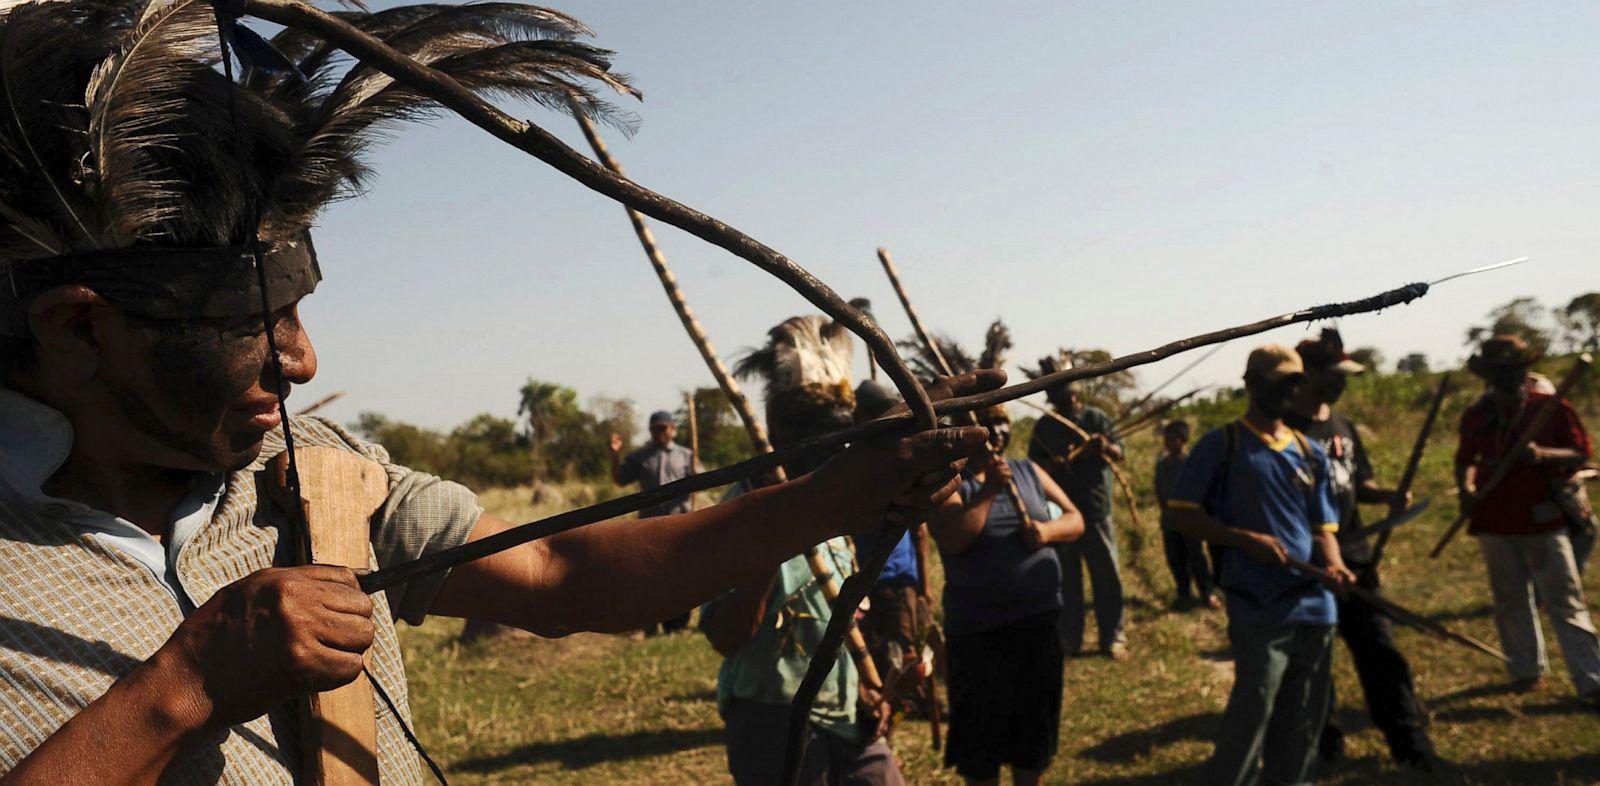 PHOTO: Brazilian Indians of the Guarani-Kaiowa tribe invade a private ranch